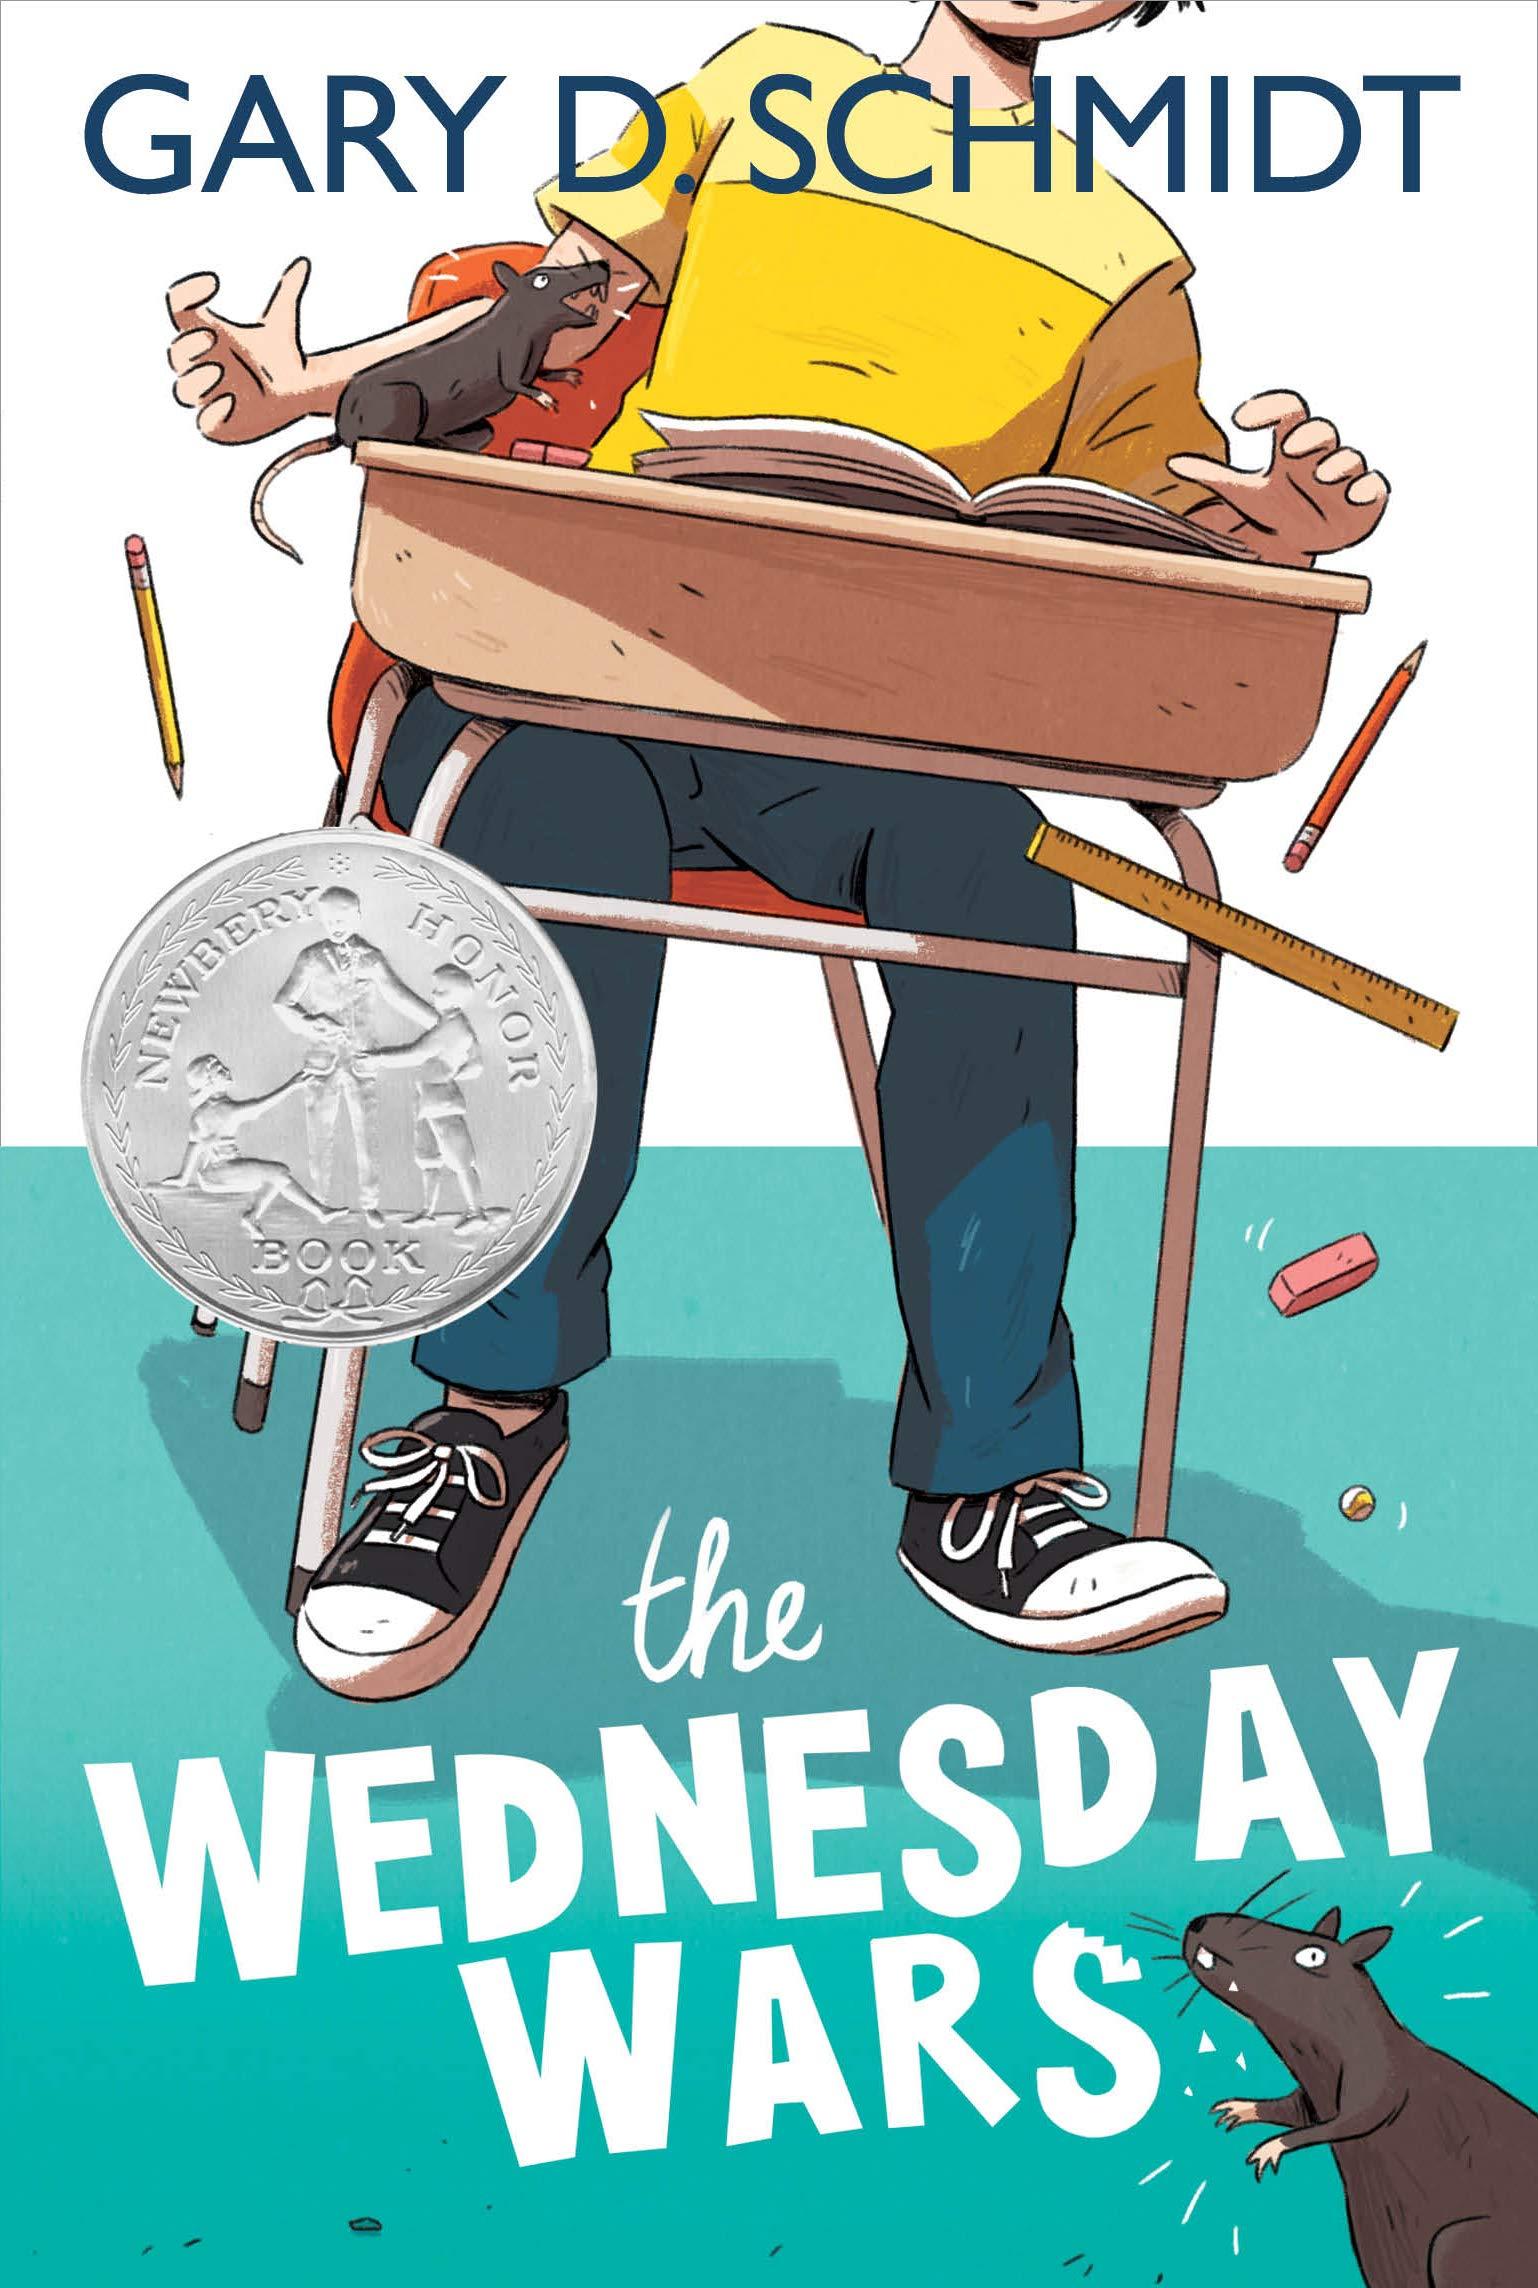 The Wednesday Wars: Schmidt, Gary D.: 9780547237602: Amazon.com: Books